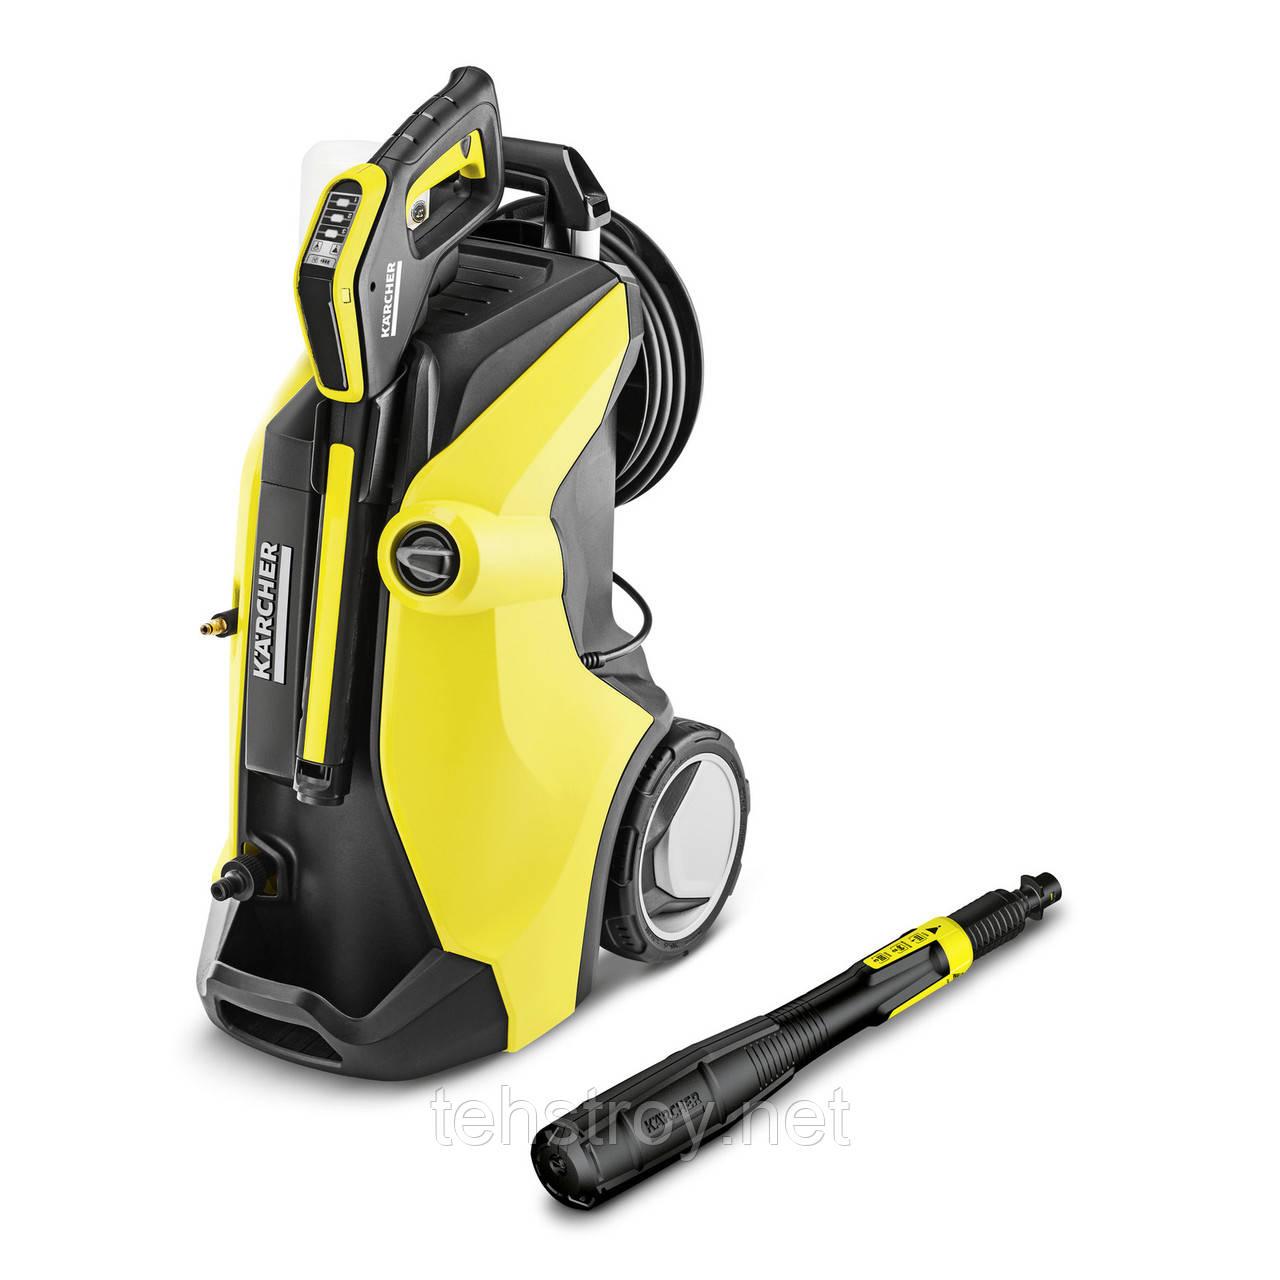 Karcher K 7 Premium Full Control Plus Мойка высокого давления